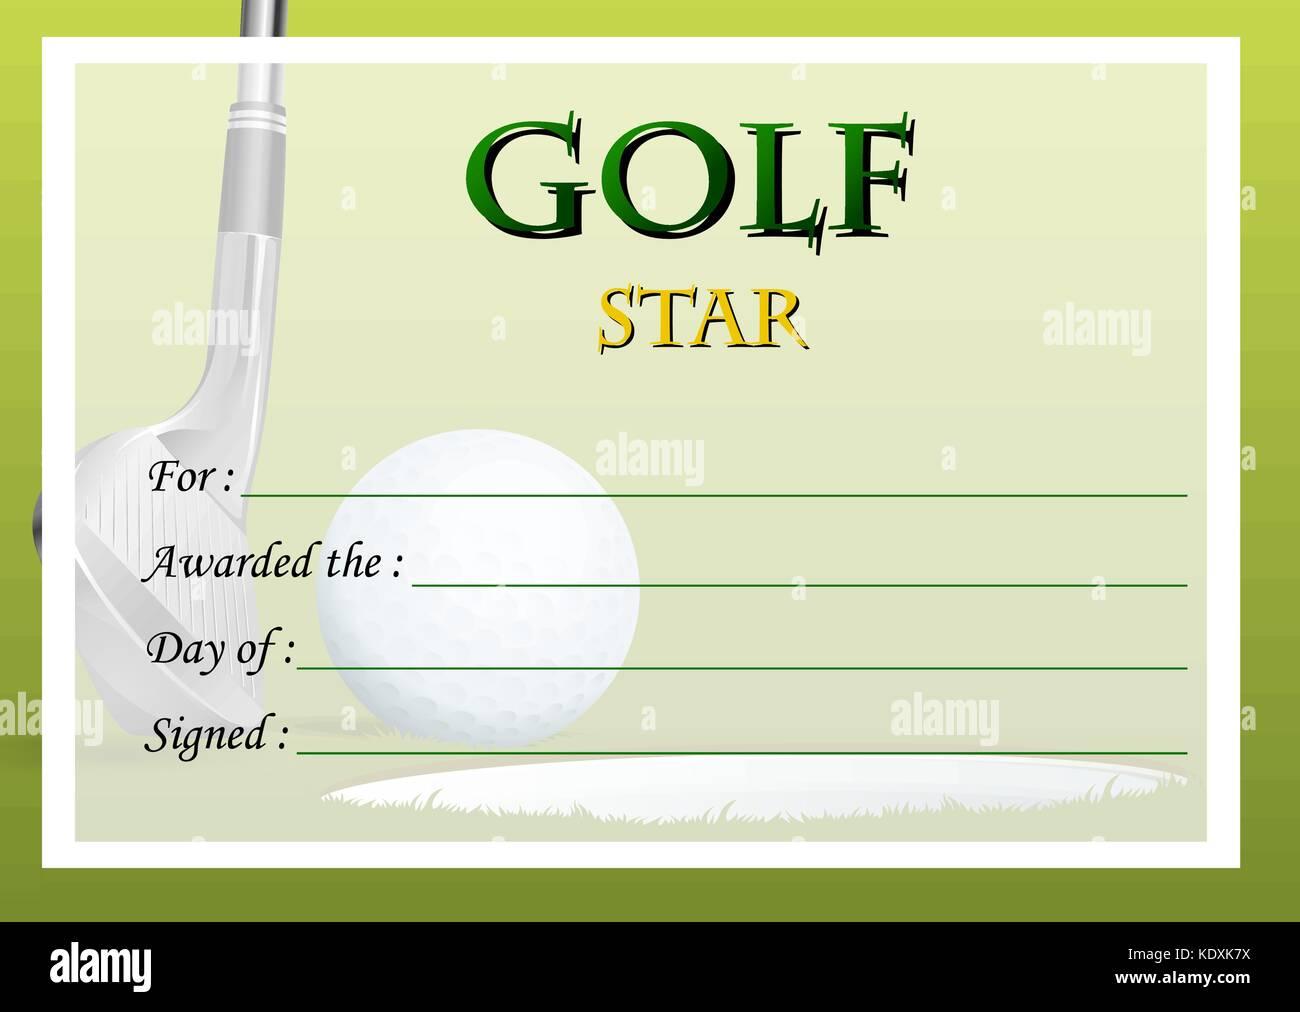 Amazoncom Seller Profile Callaway Golf PreOwned